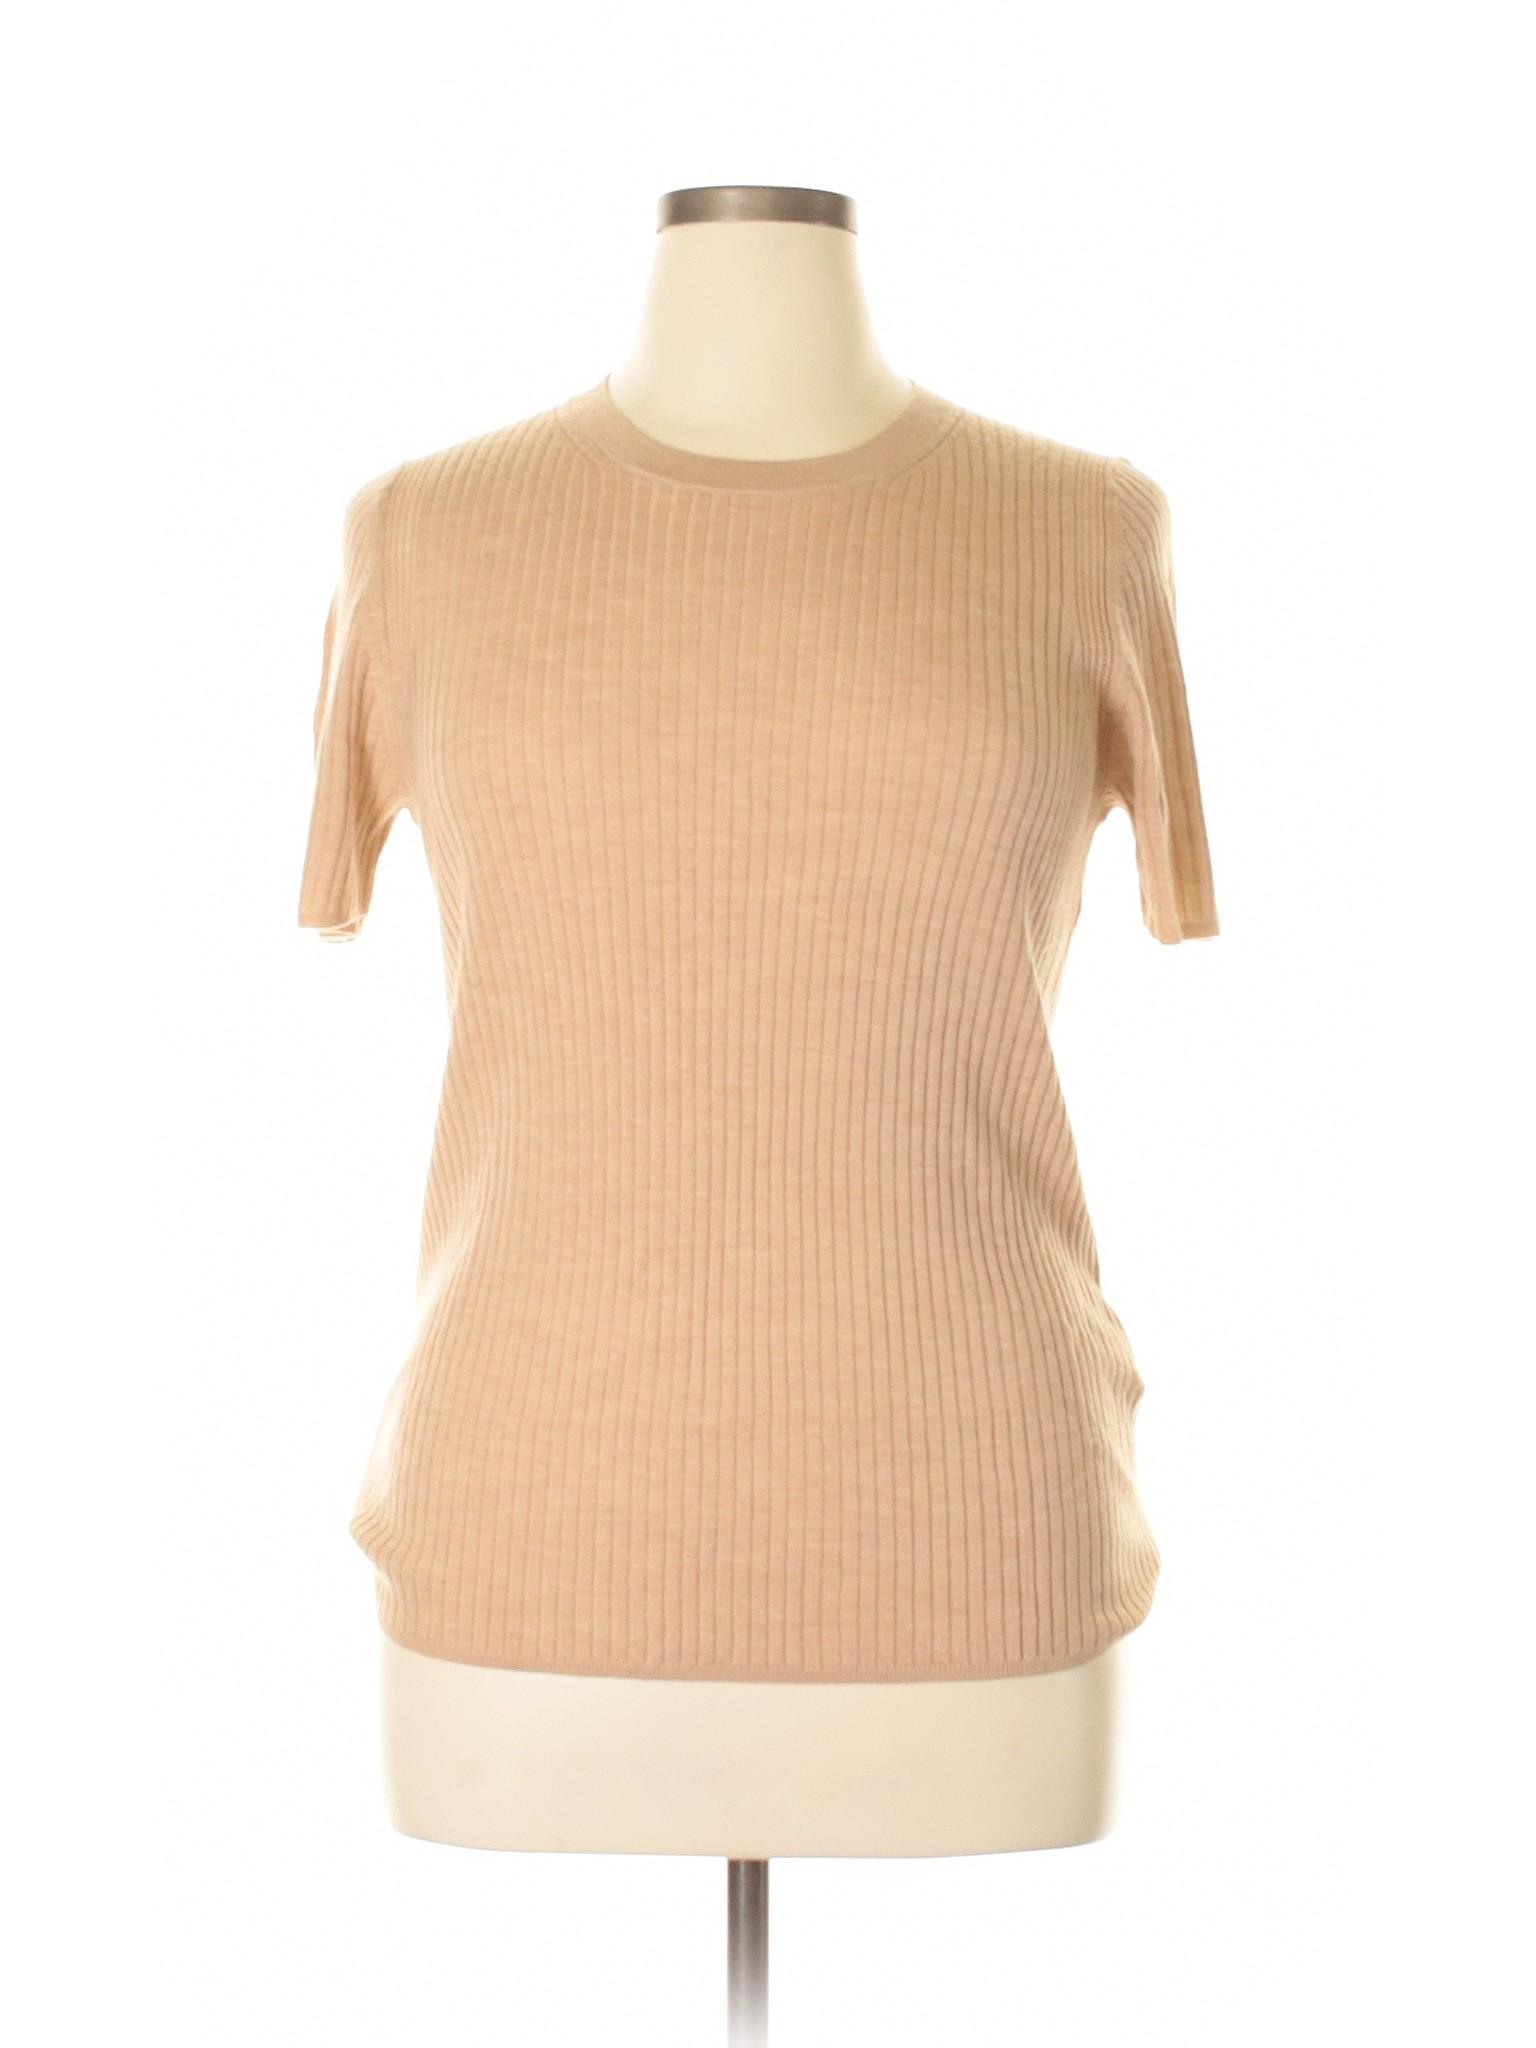 Republic winter Banana Pullover Boutique Wool Sweater v74aq